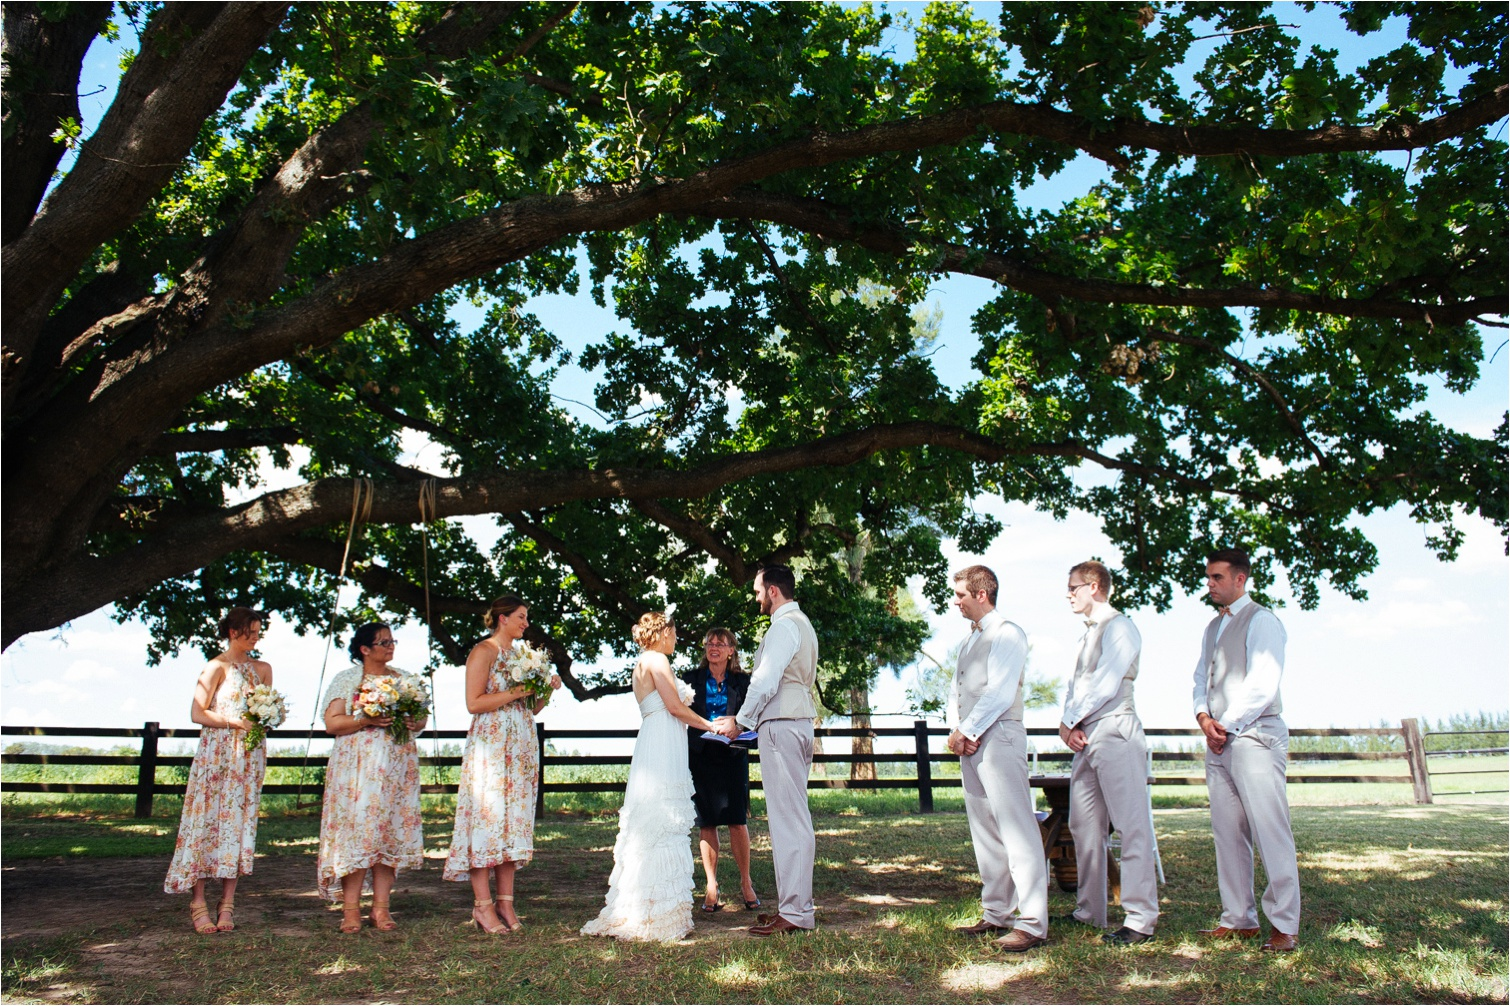 Jenny&Mitch_Sebel_Windsor_Sydney_Polo_Club_wedding-by_The_Follans_Gold_Coast_Wedding_Photographers_0054.jpg